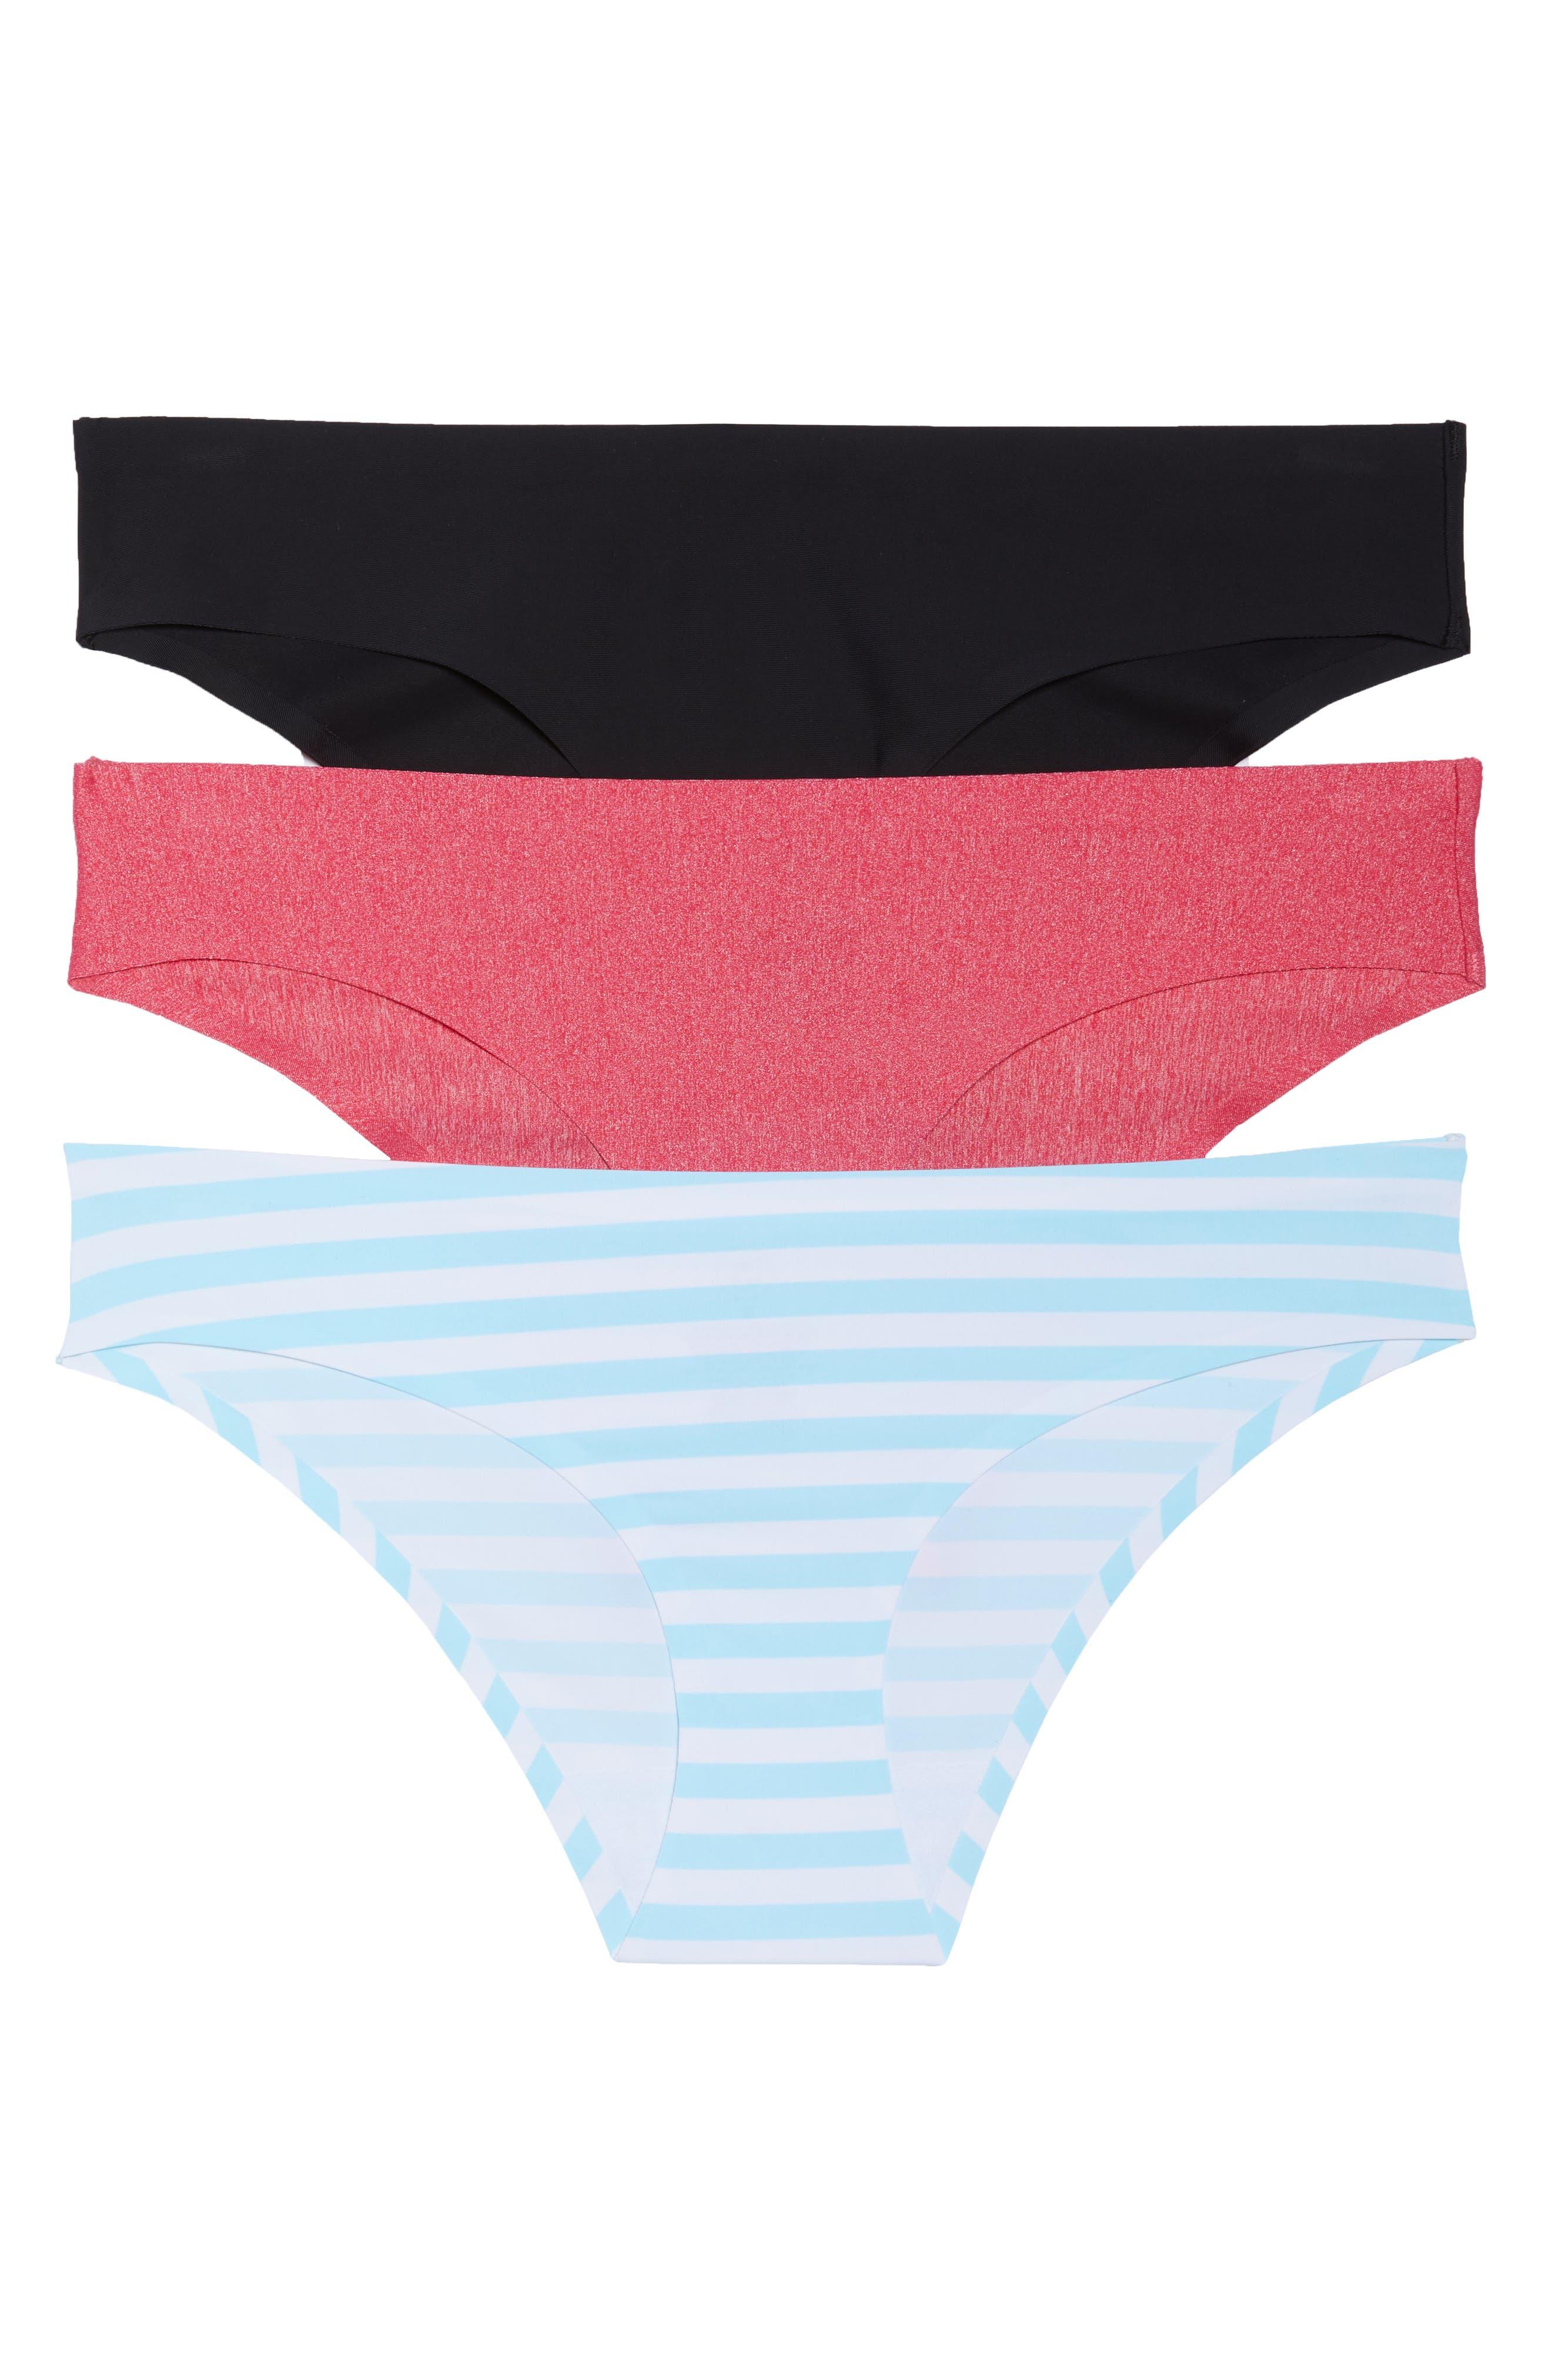 3-Pack Hipster Panties,                         Main,                         color, Black/ Poppy/ Marine Stripe